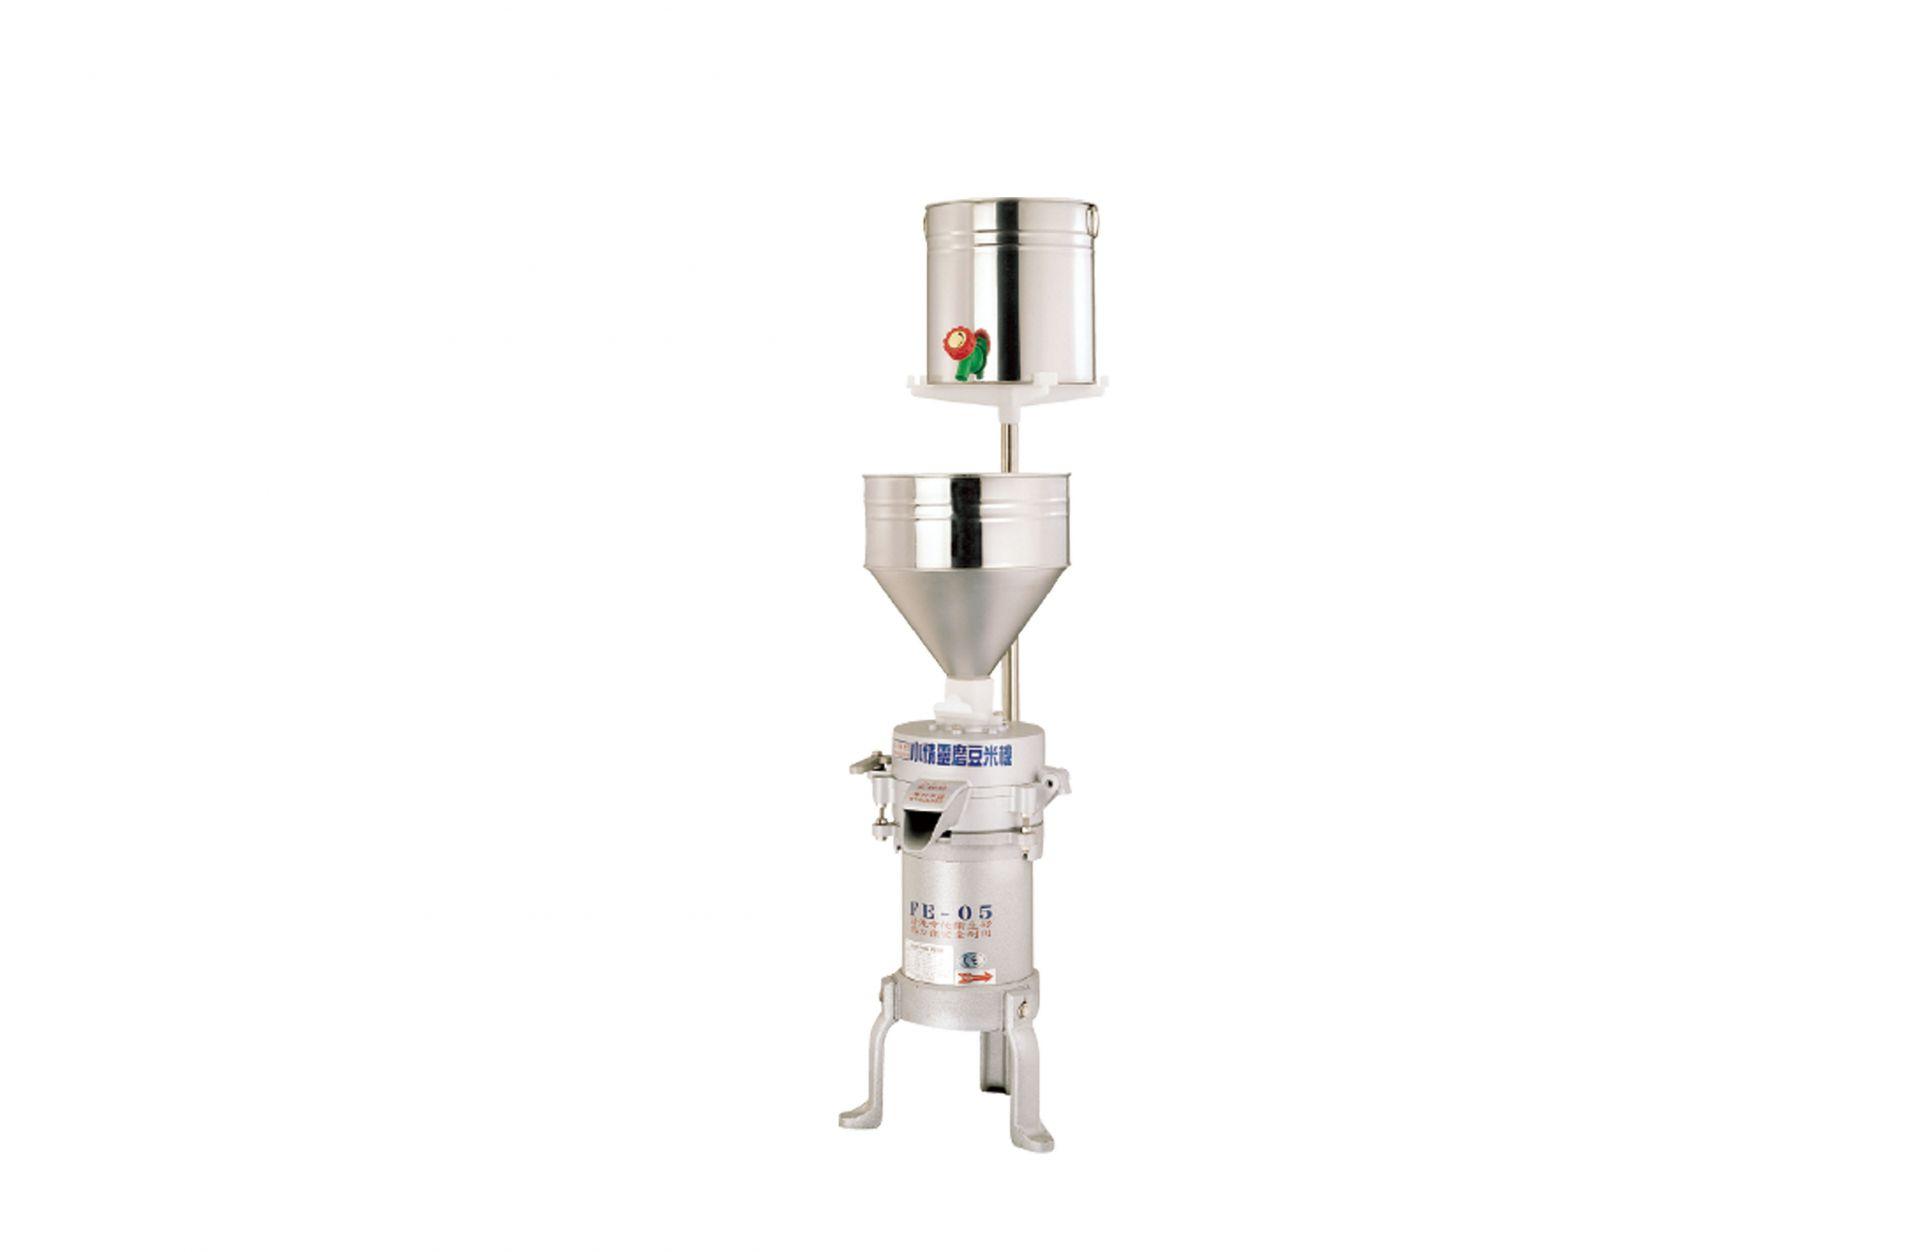 Soya pirinç taşlama makinası - Taşlama makinesi